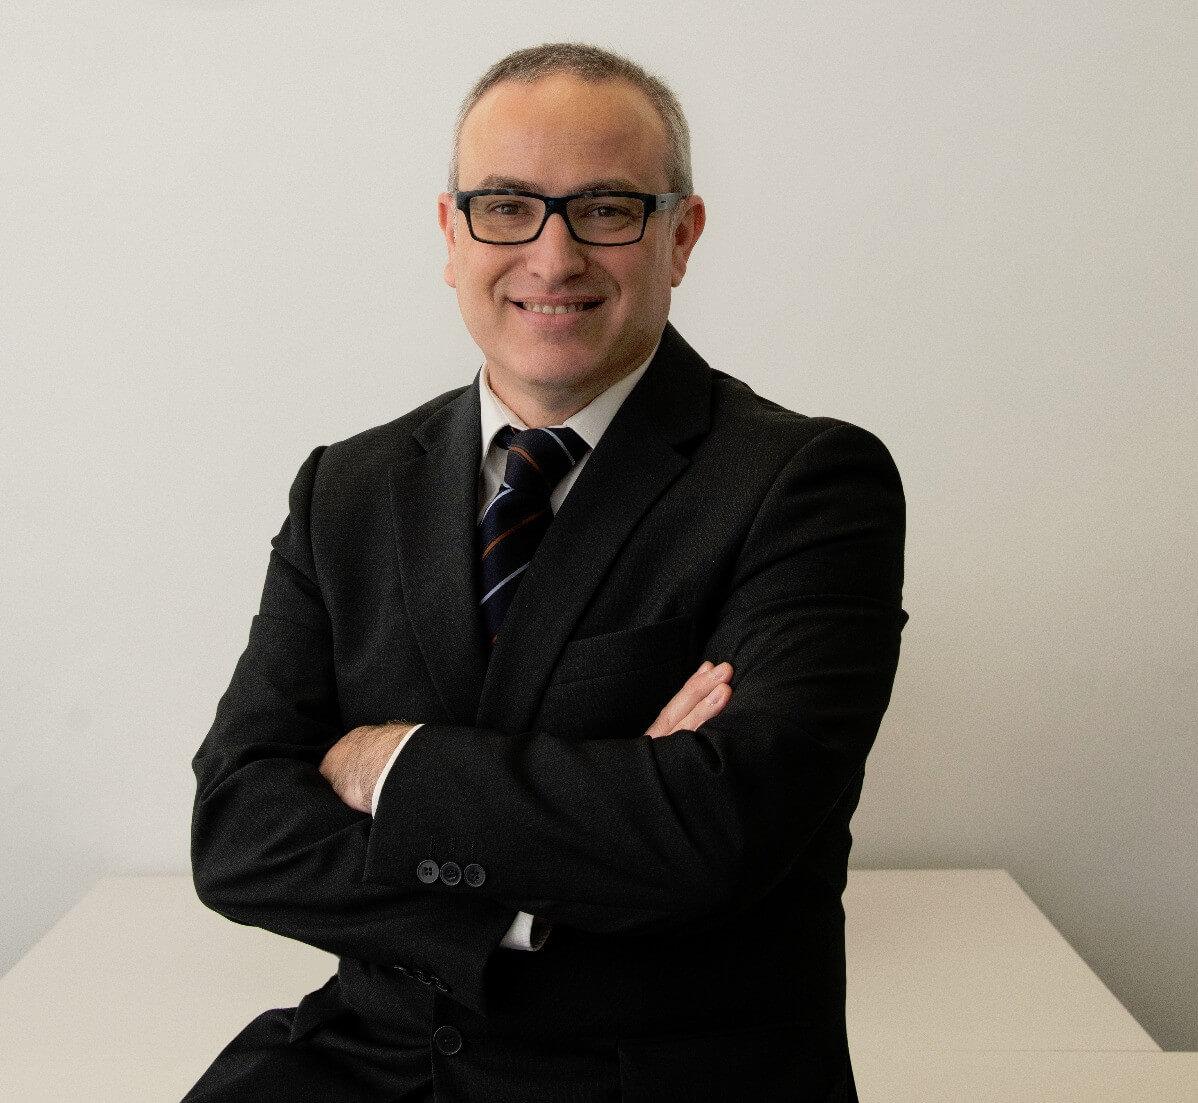 Octavio Royo Benaches